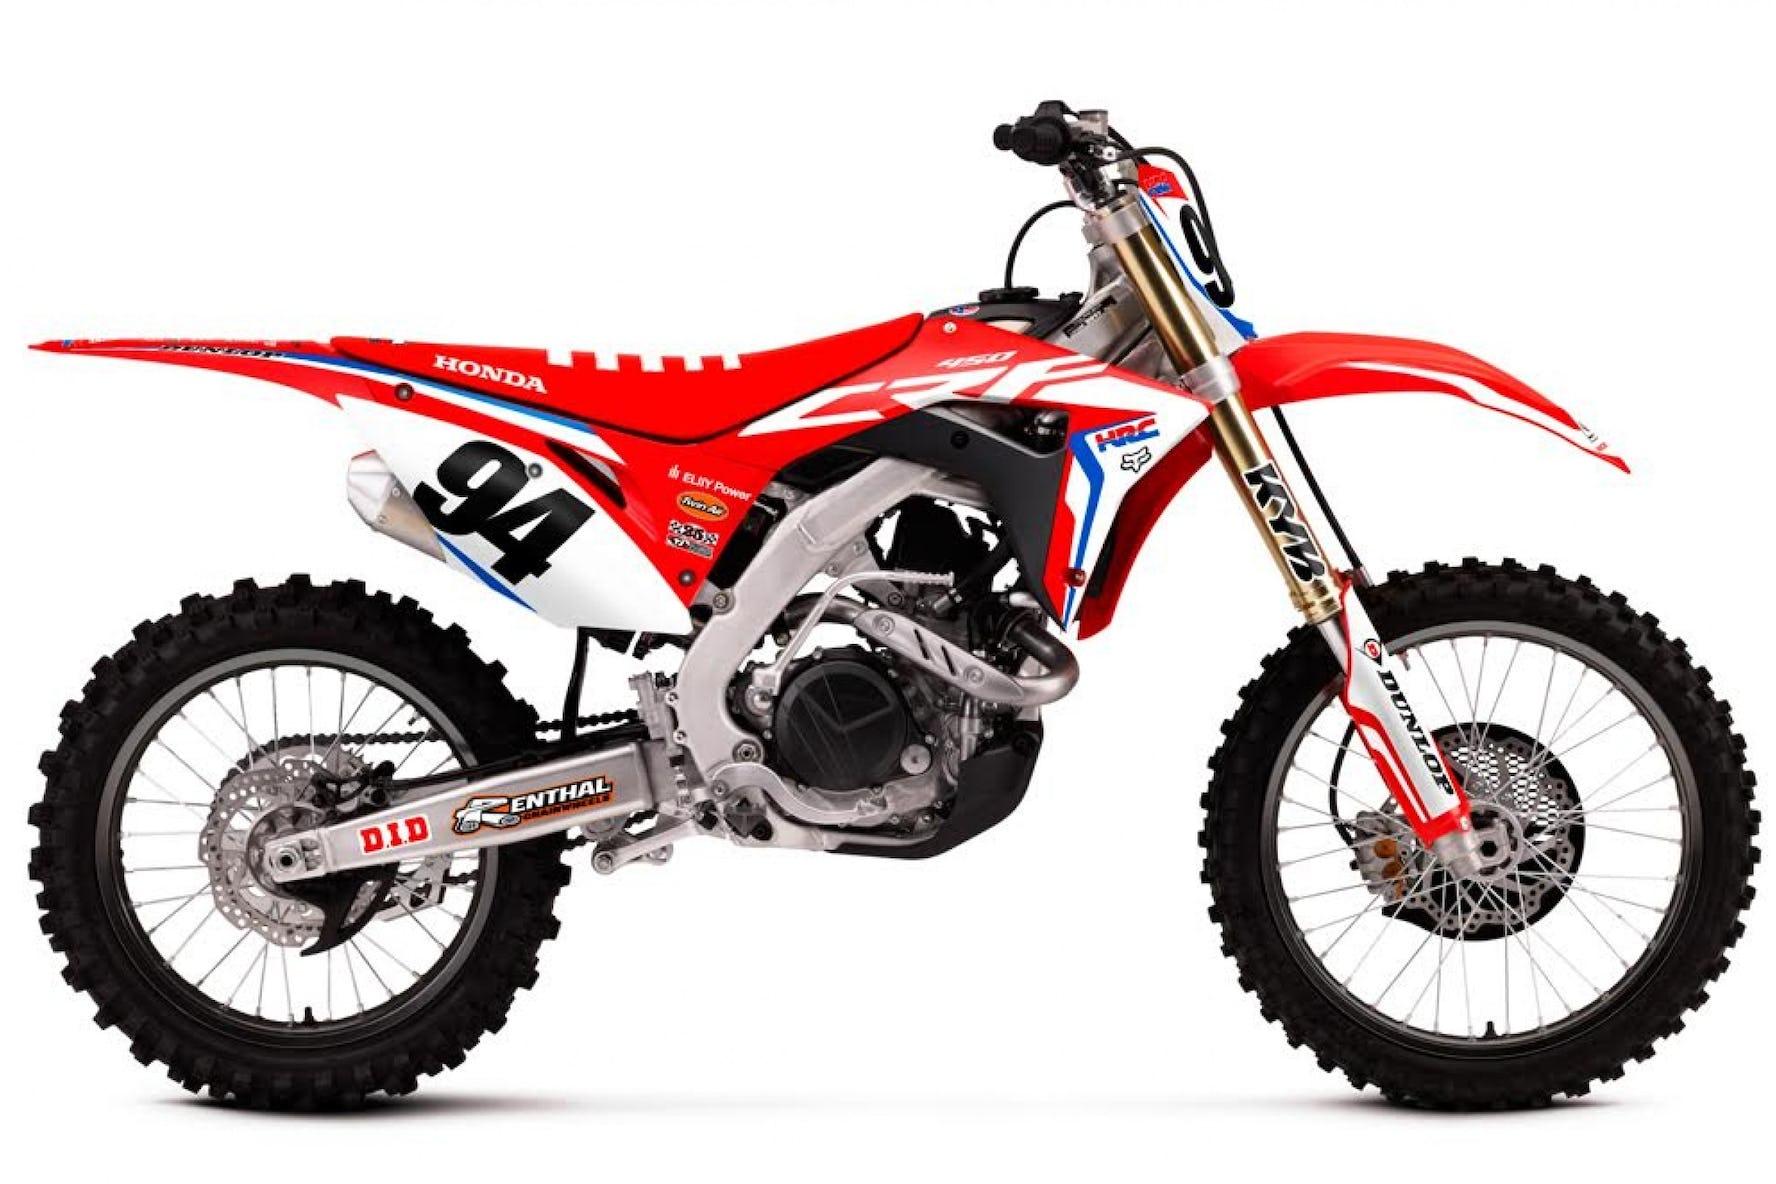 Throttle Jockey To Release 2017 Honda Hrc Team Graphics